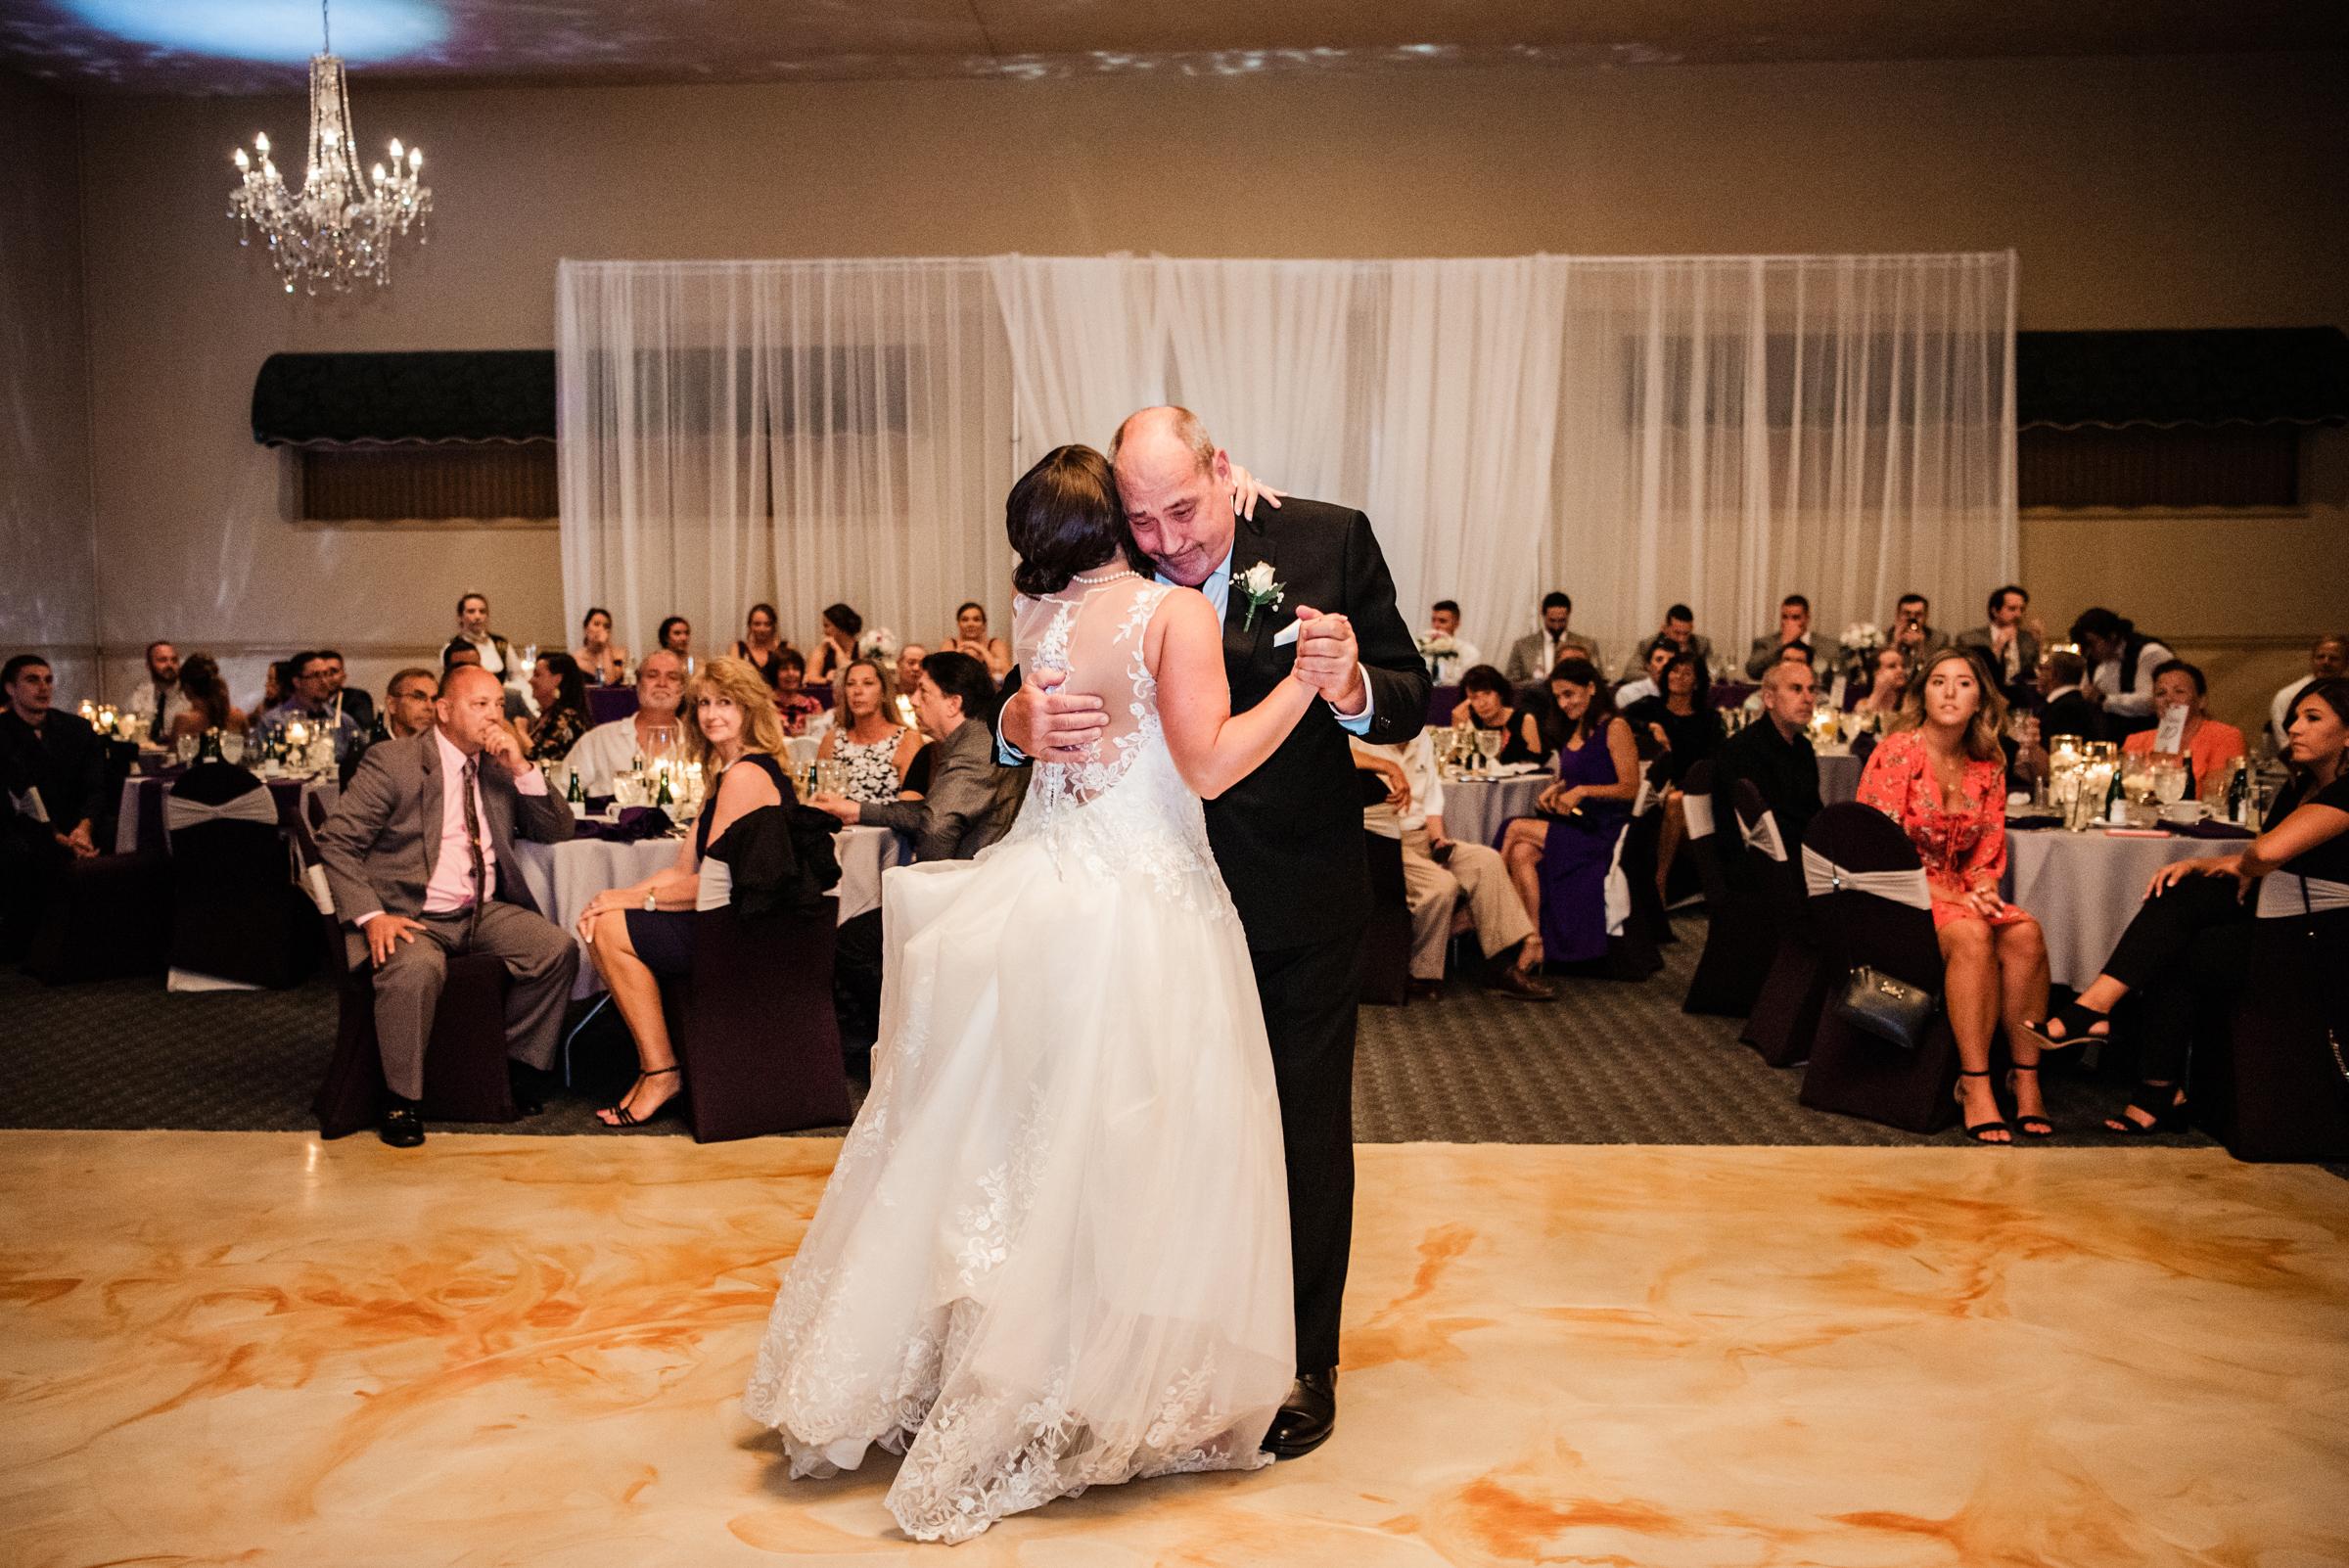 Historic_Old_St_Johns_Church_Valentinos_Banquet_Hall_Central_NY_Wedding_JILL_STUDIO_Rochester_NY_Photographer_DSC_6746.jpg